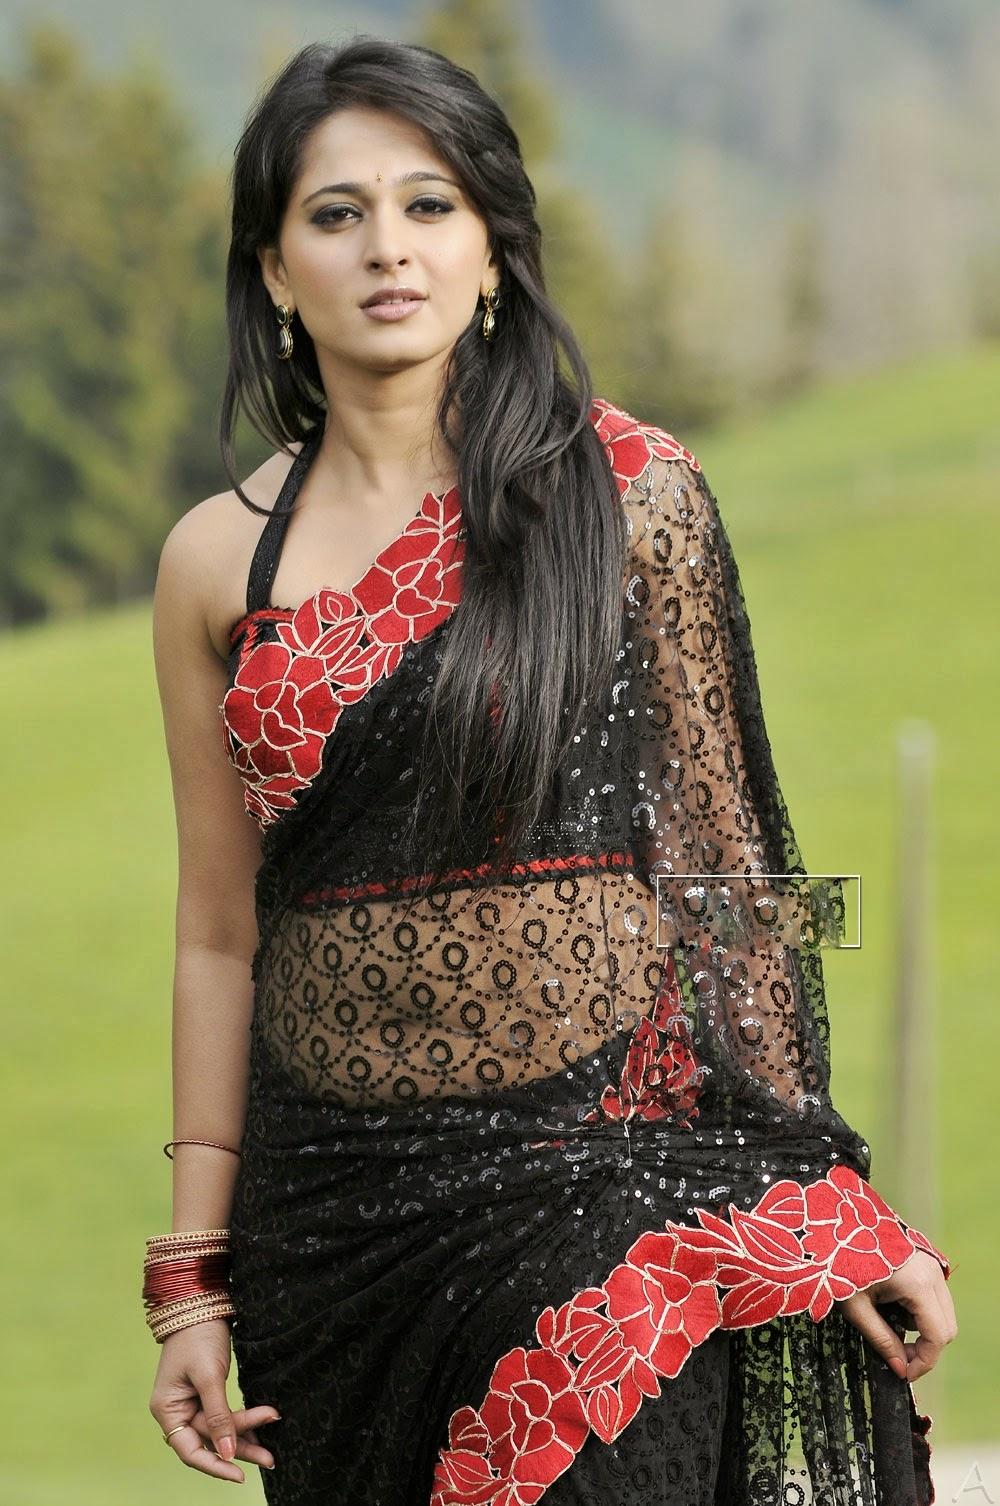 Spicy Saree: Anushka Spicy Navel Show HD Pics In Transparent Saree